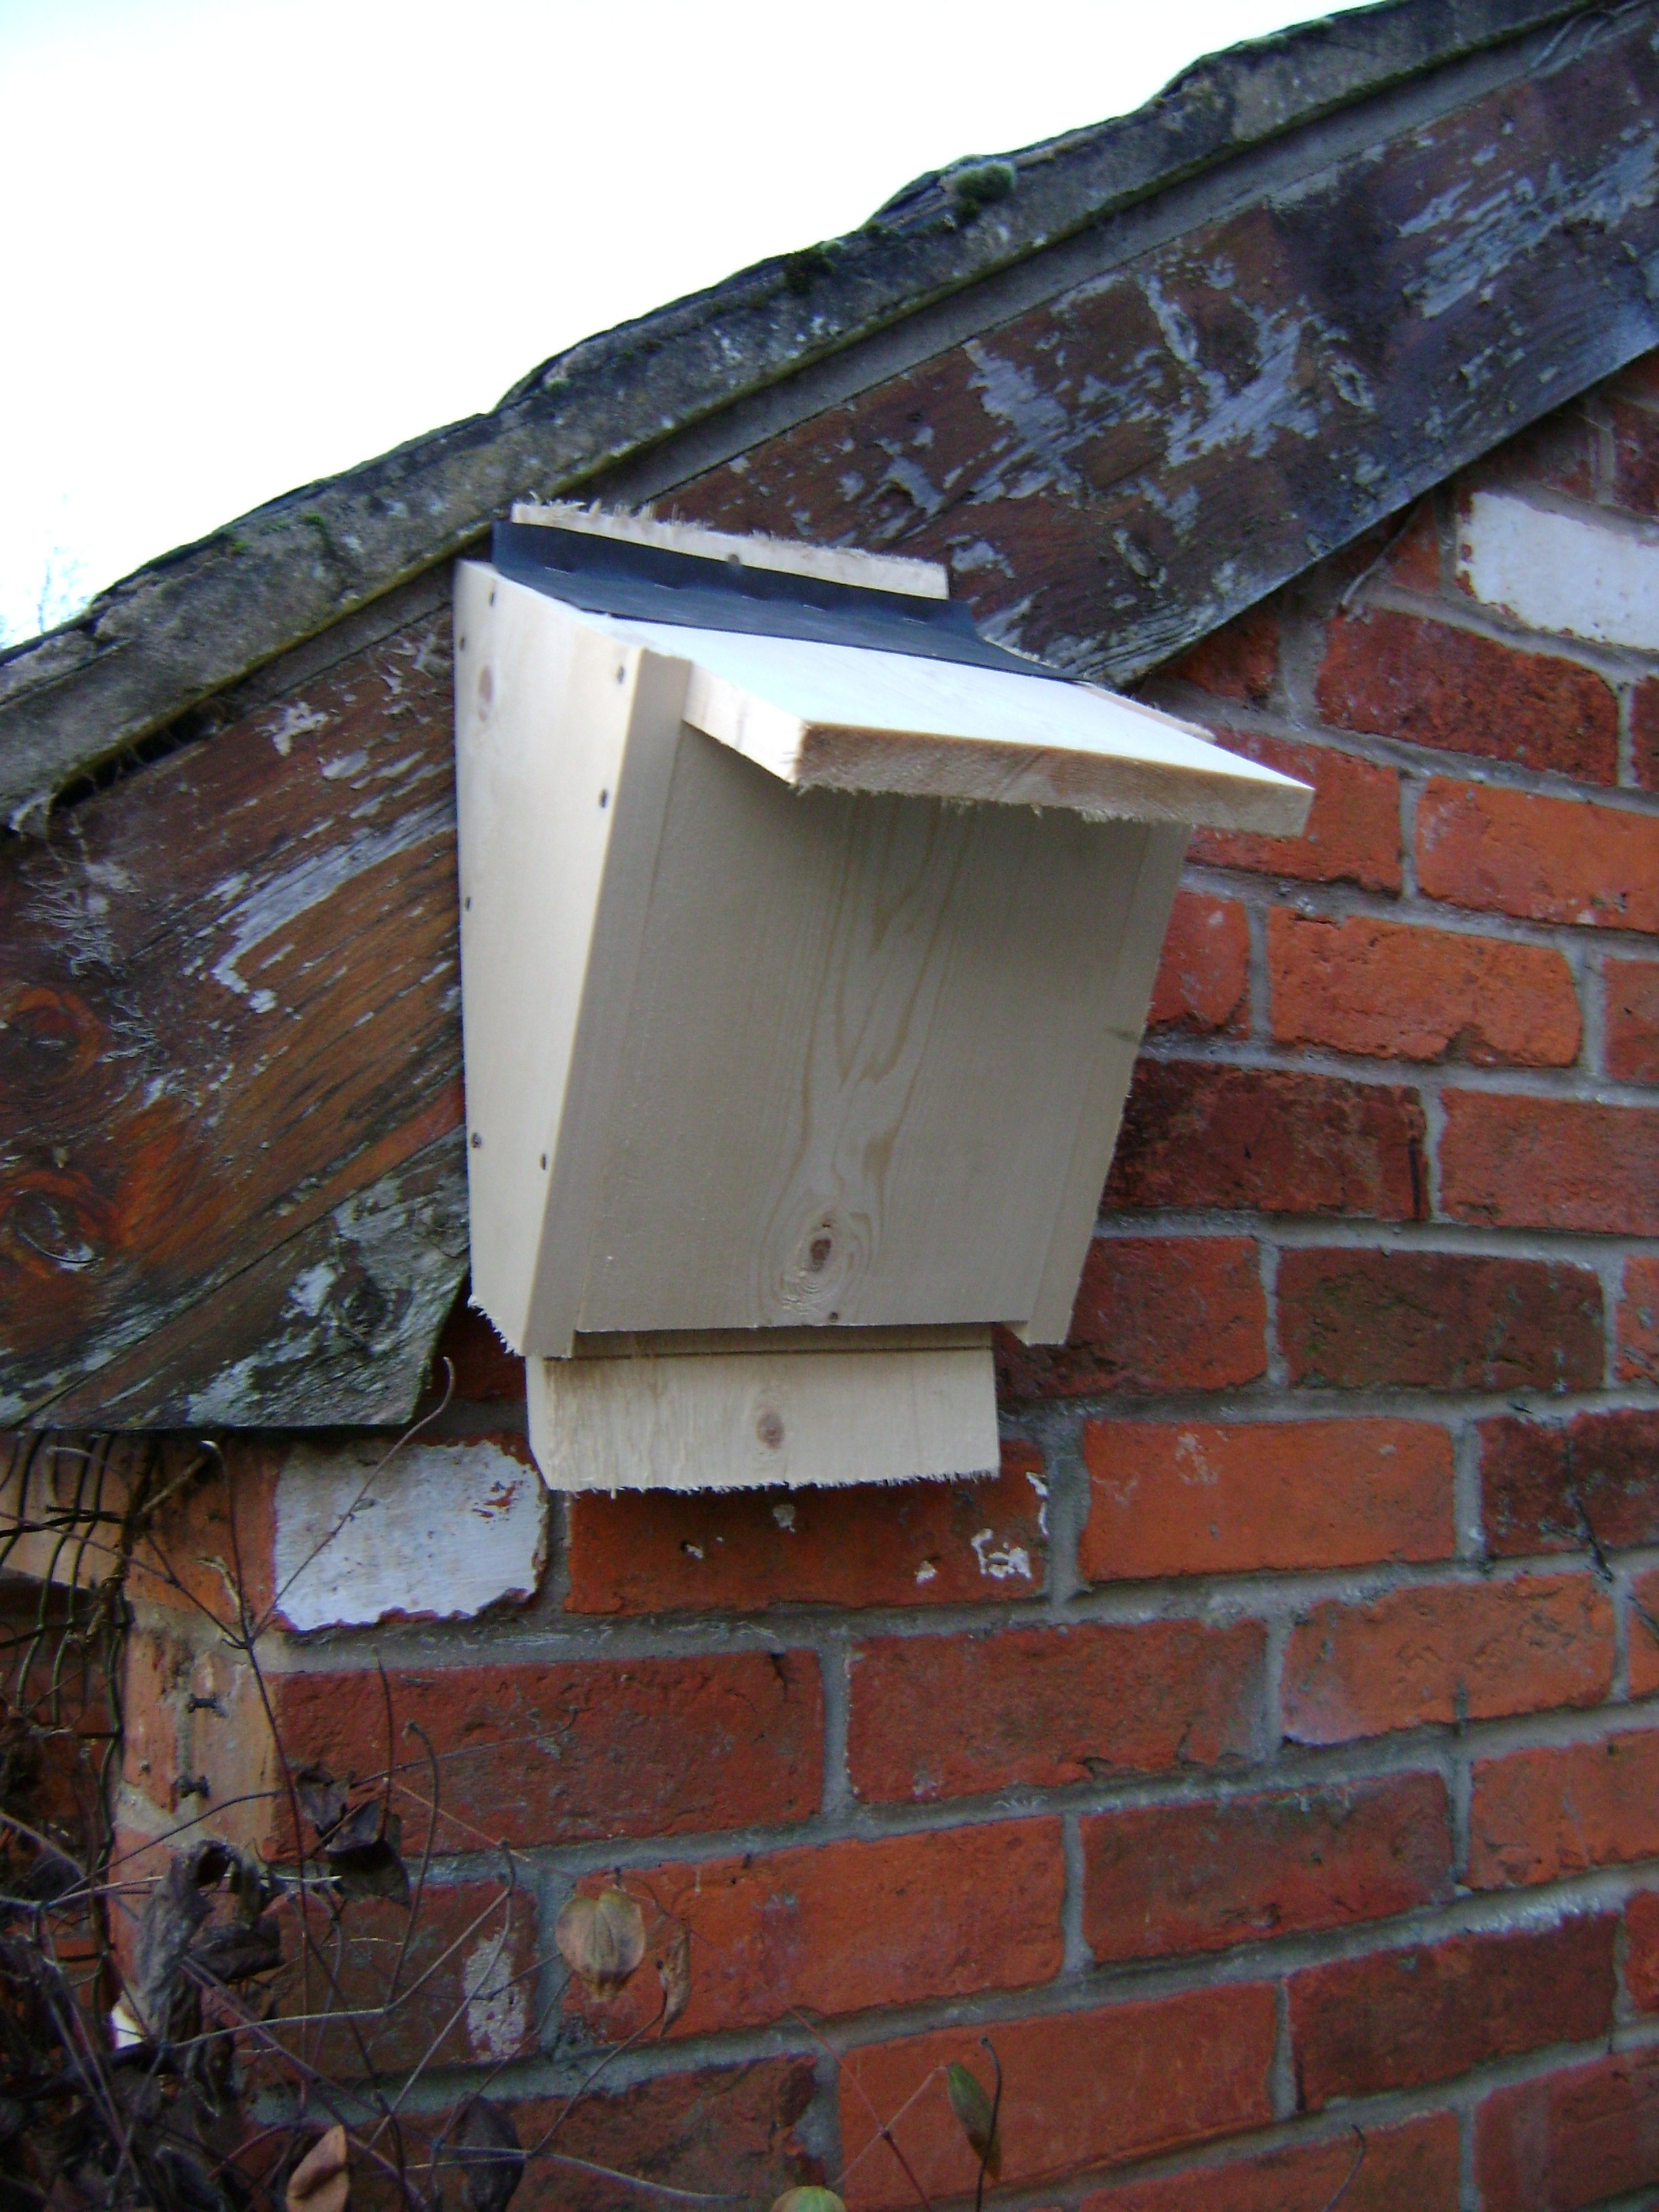 Best ideas about Bat Box DIY . Save or Pin Build a Bat Box Now.